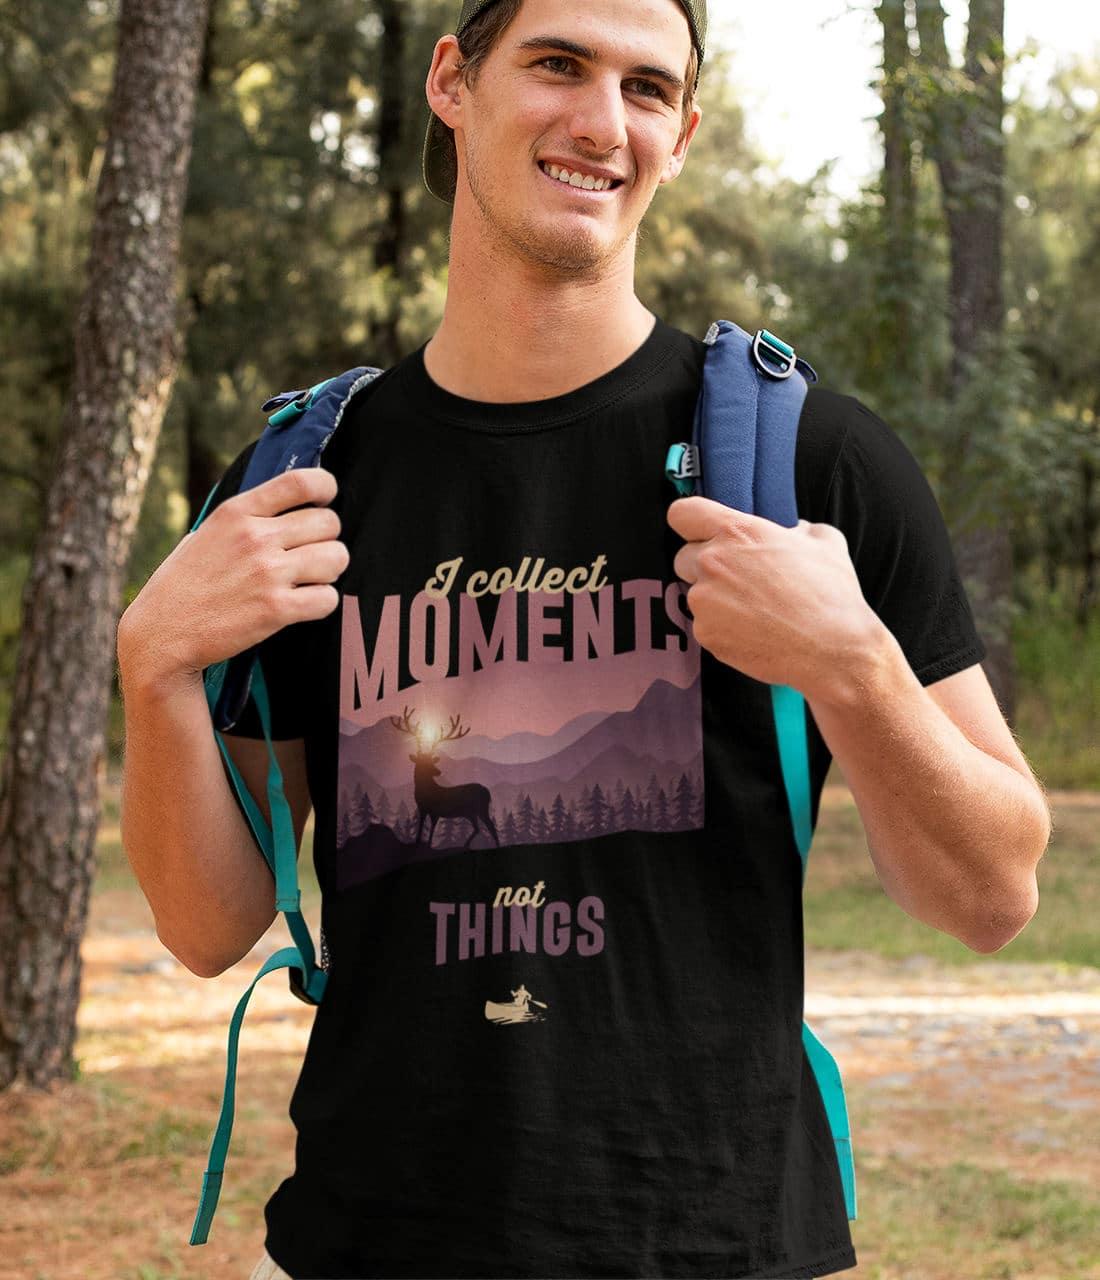 Wandern-T-Shirt-I-collect-moments